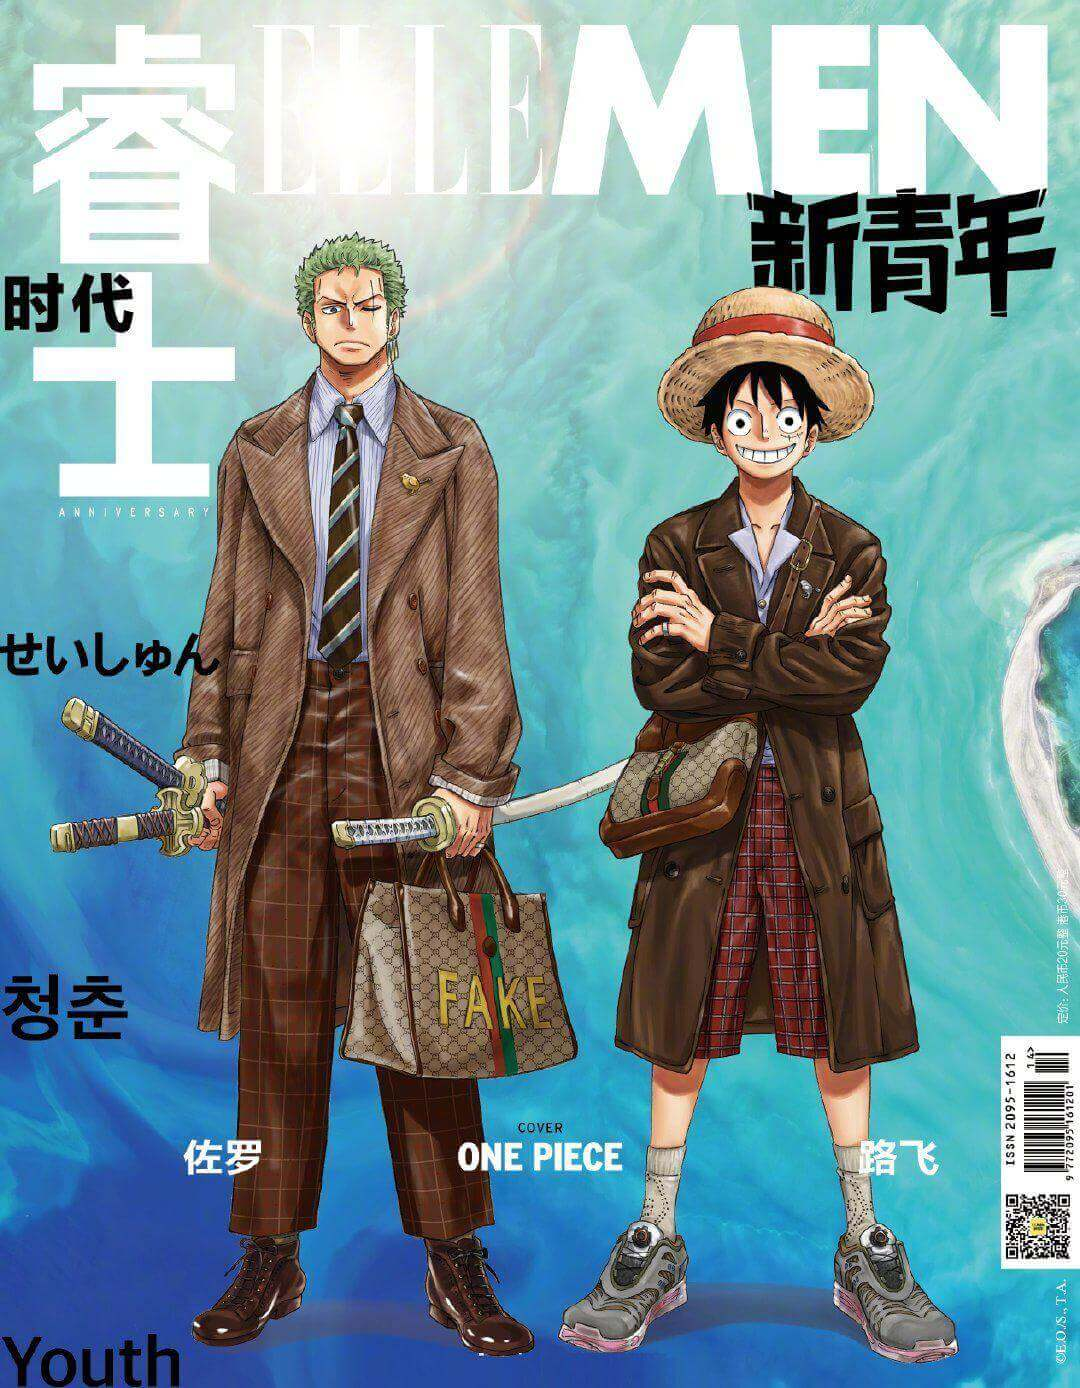 One Piece e Gucci colaboram para a revista ELLE MEN